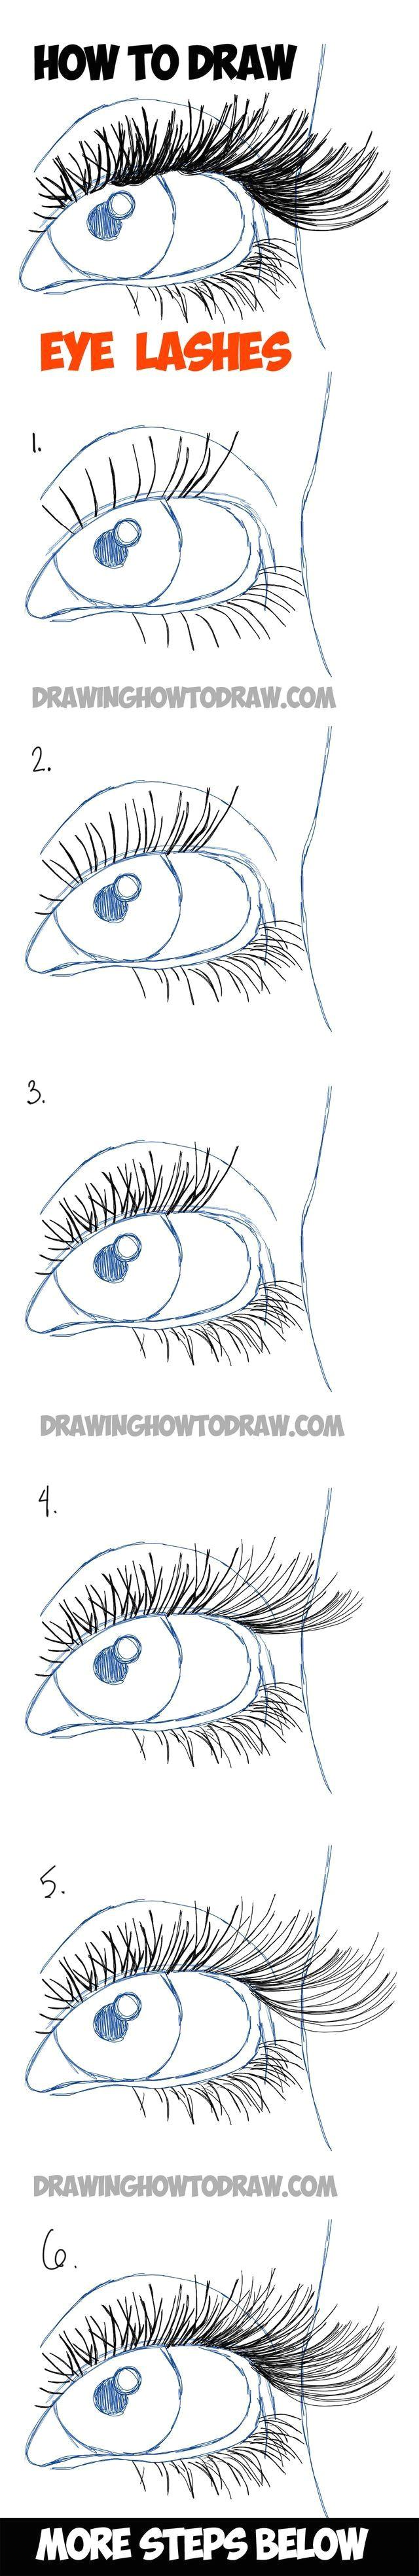 pin by katniss diamond on drawings drawings art drawings drawing tips